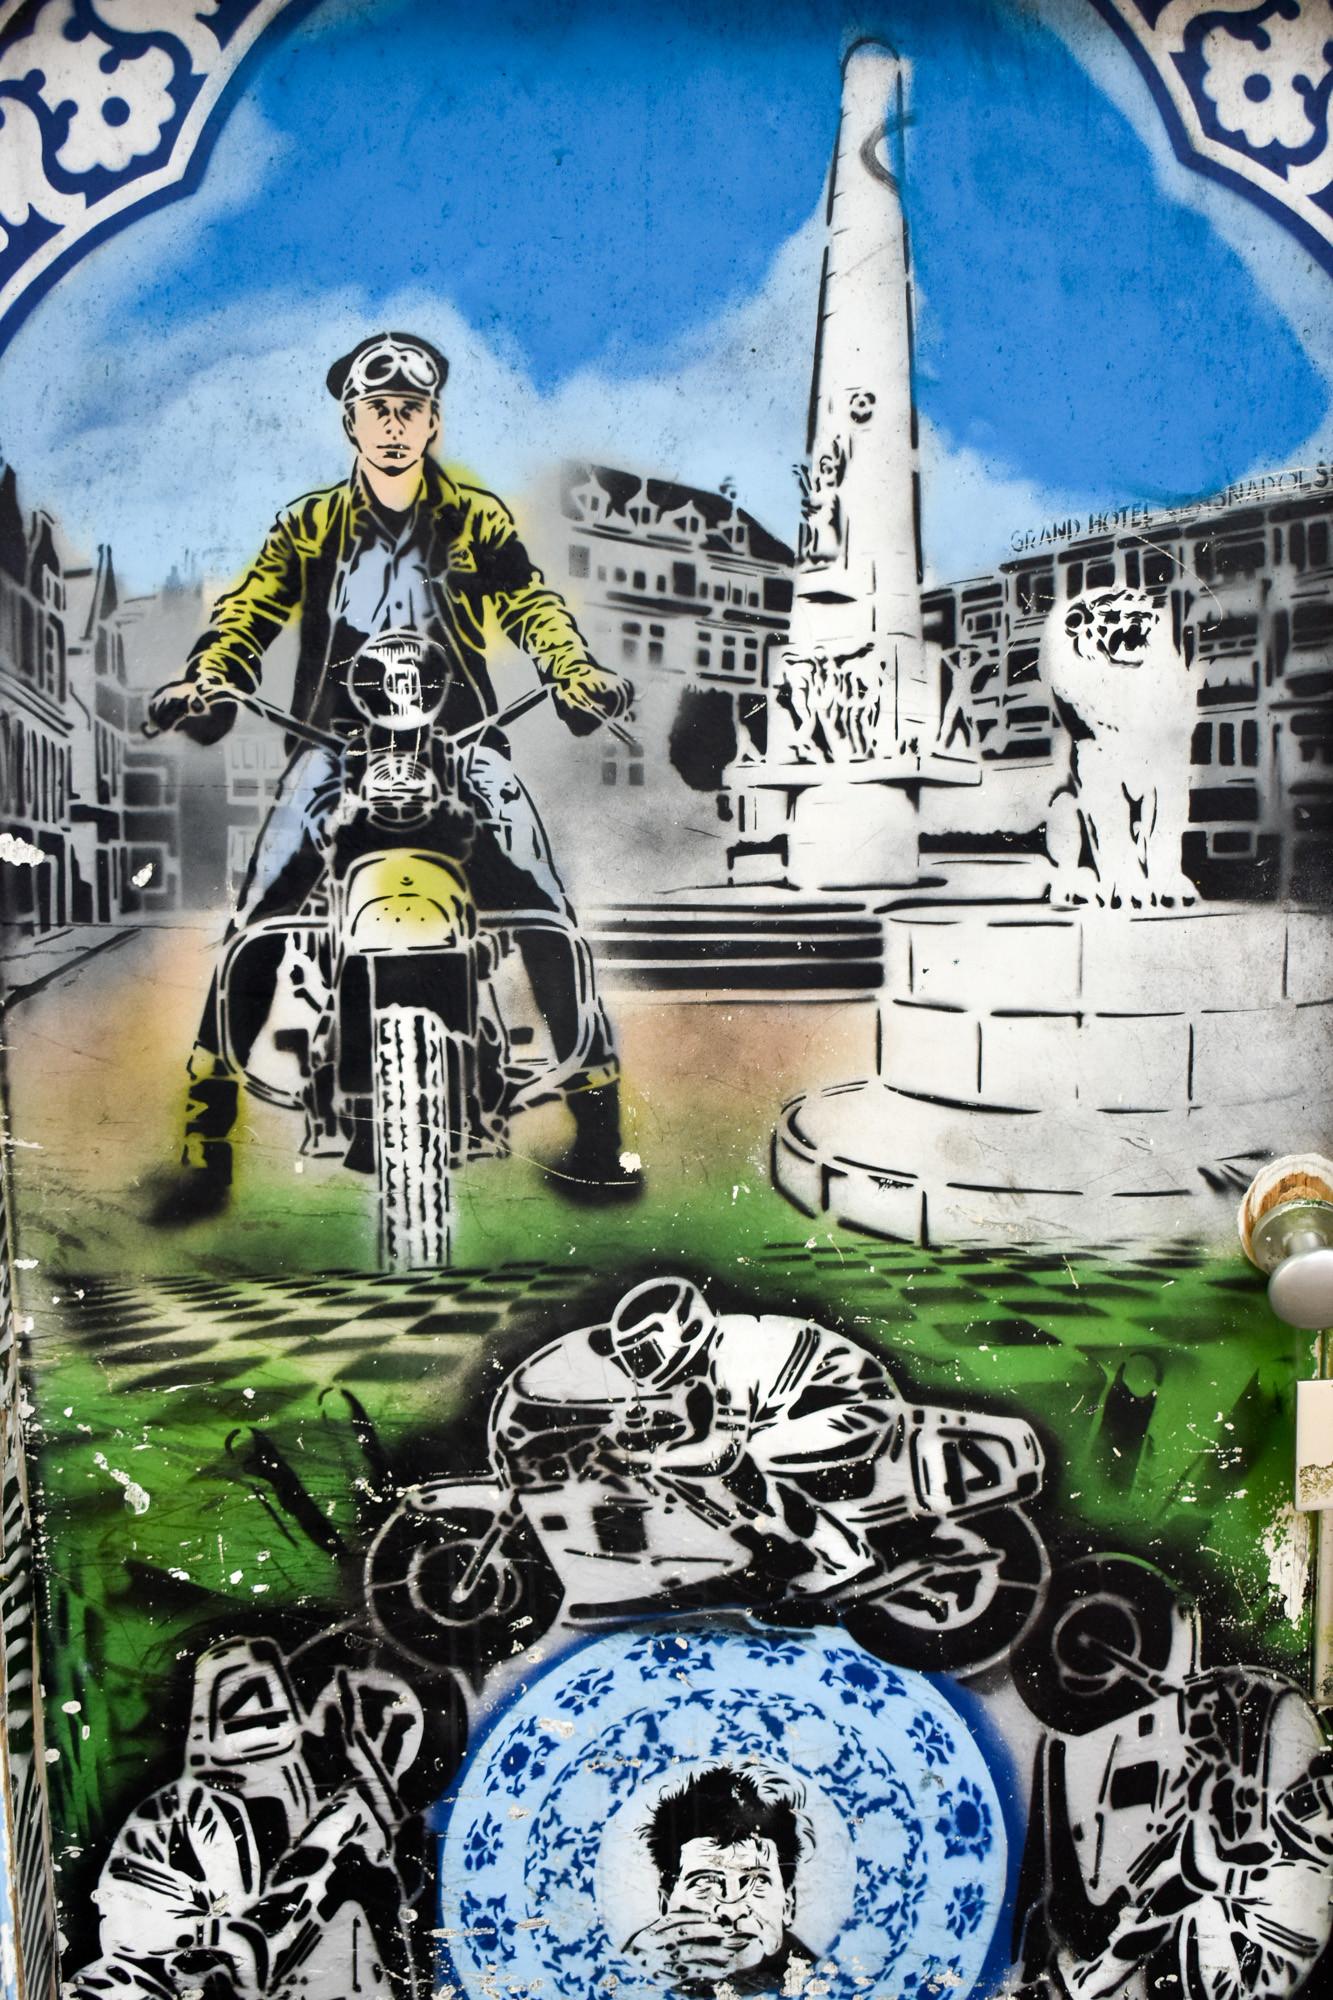 Graffiti urban Hugo Kaagman Jan Cremer